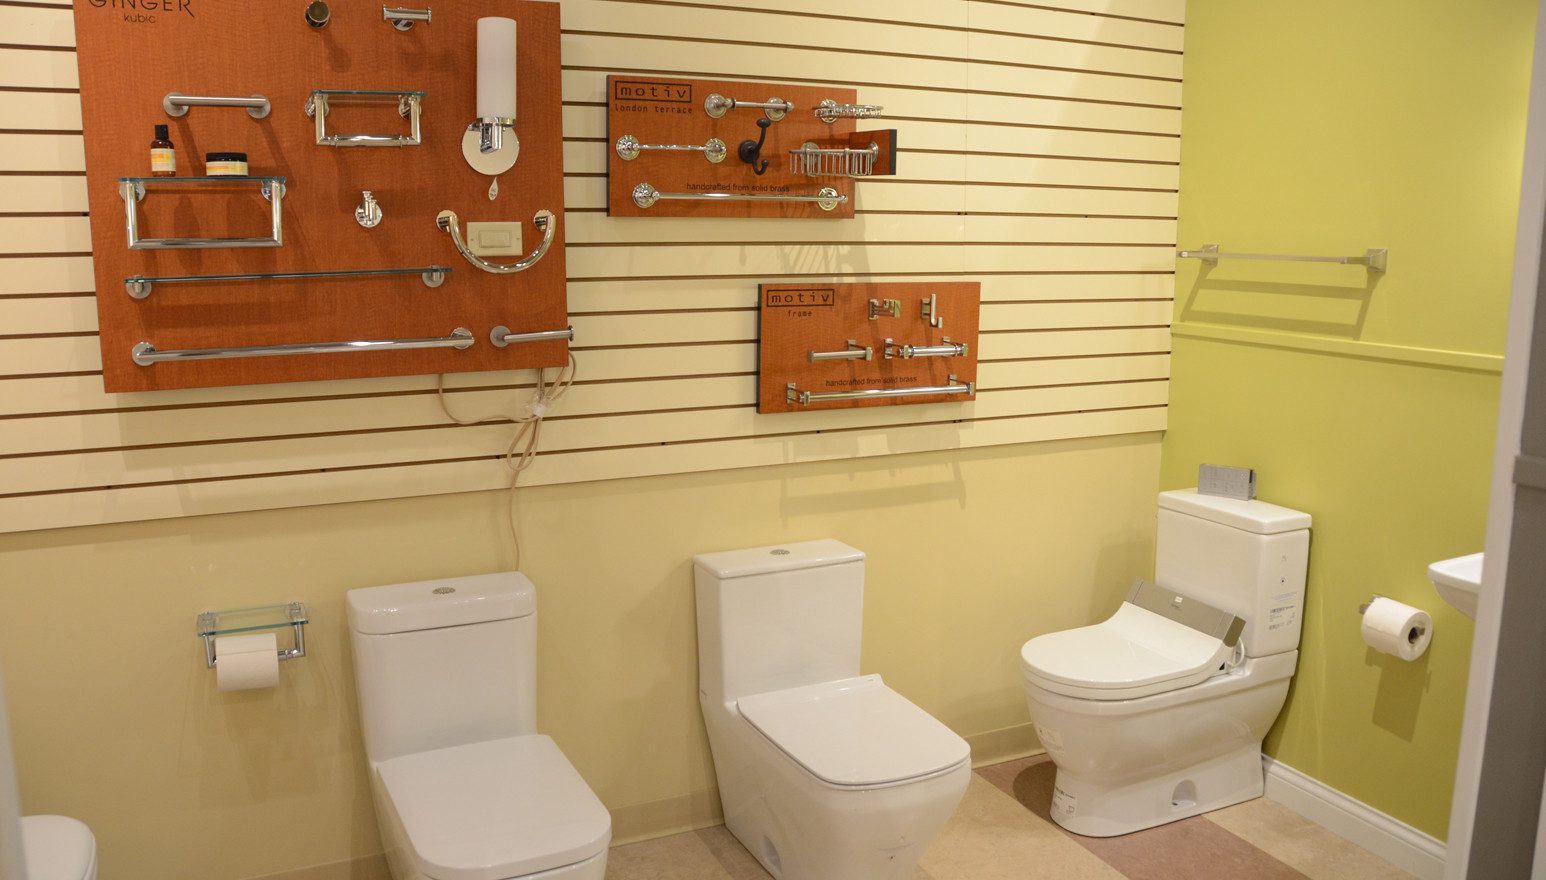 Durivit Toilets & Ginger Accessories